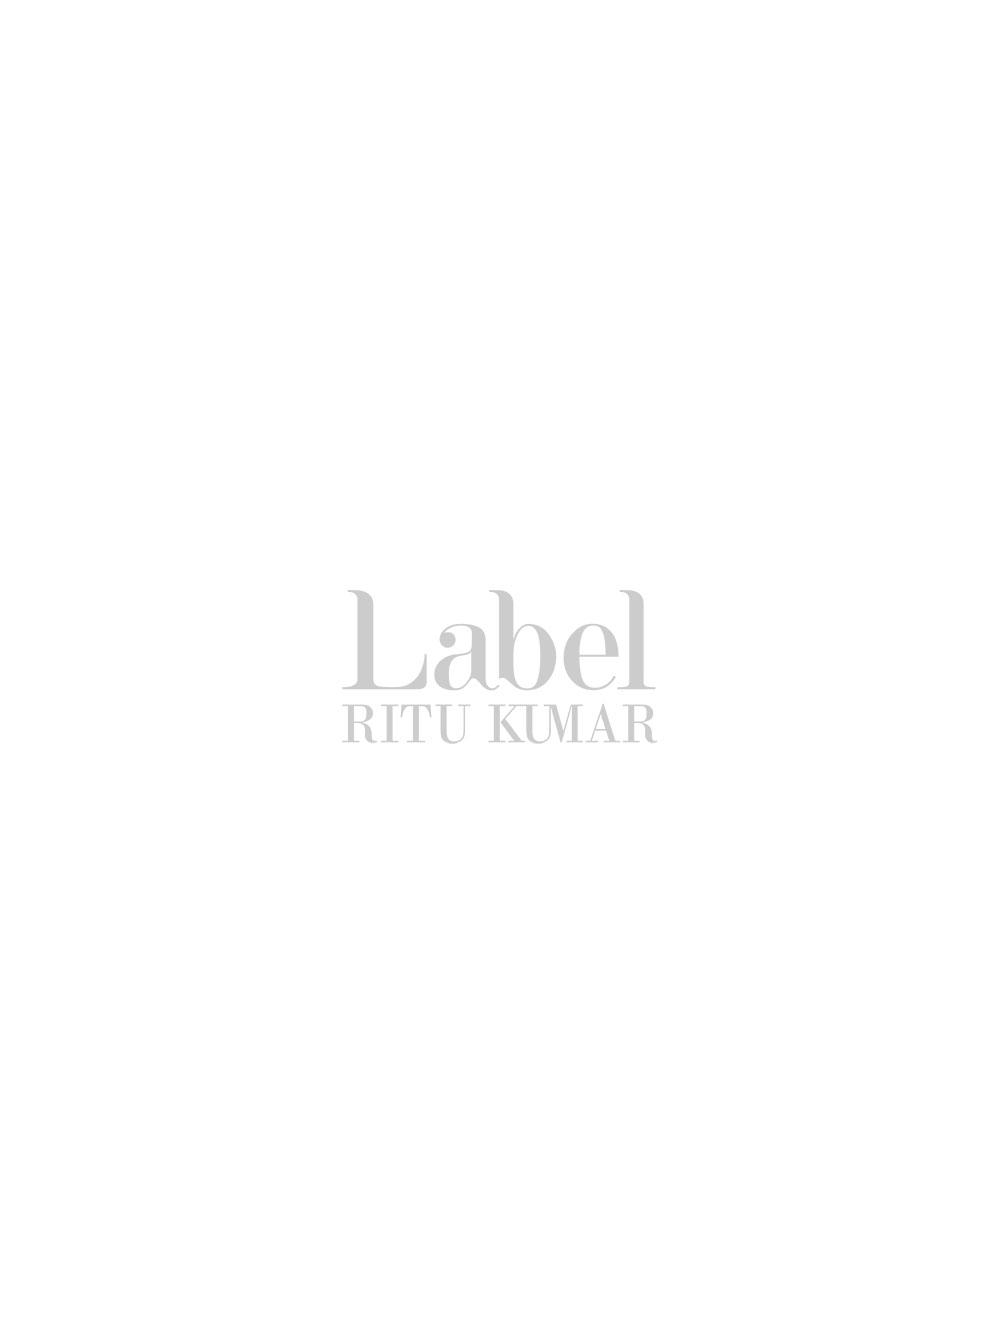 Aditi Rao's Black & White Embroidered Trench Coat